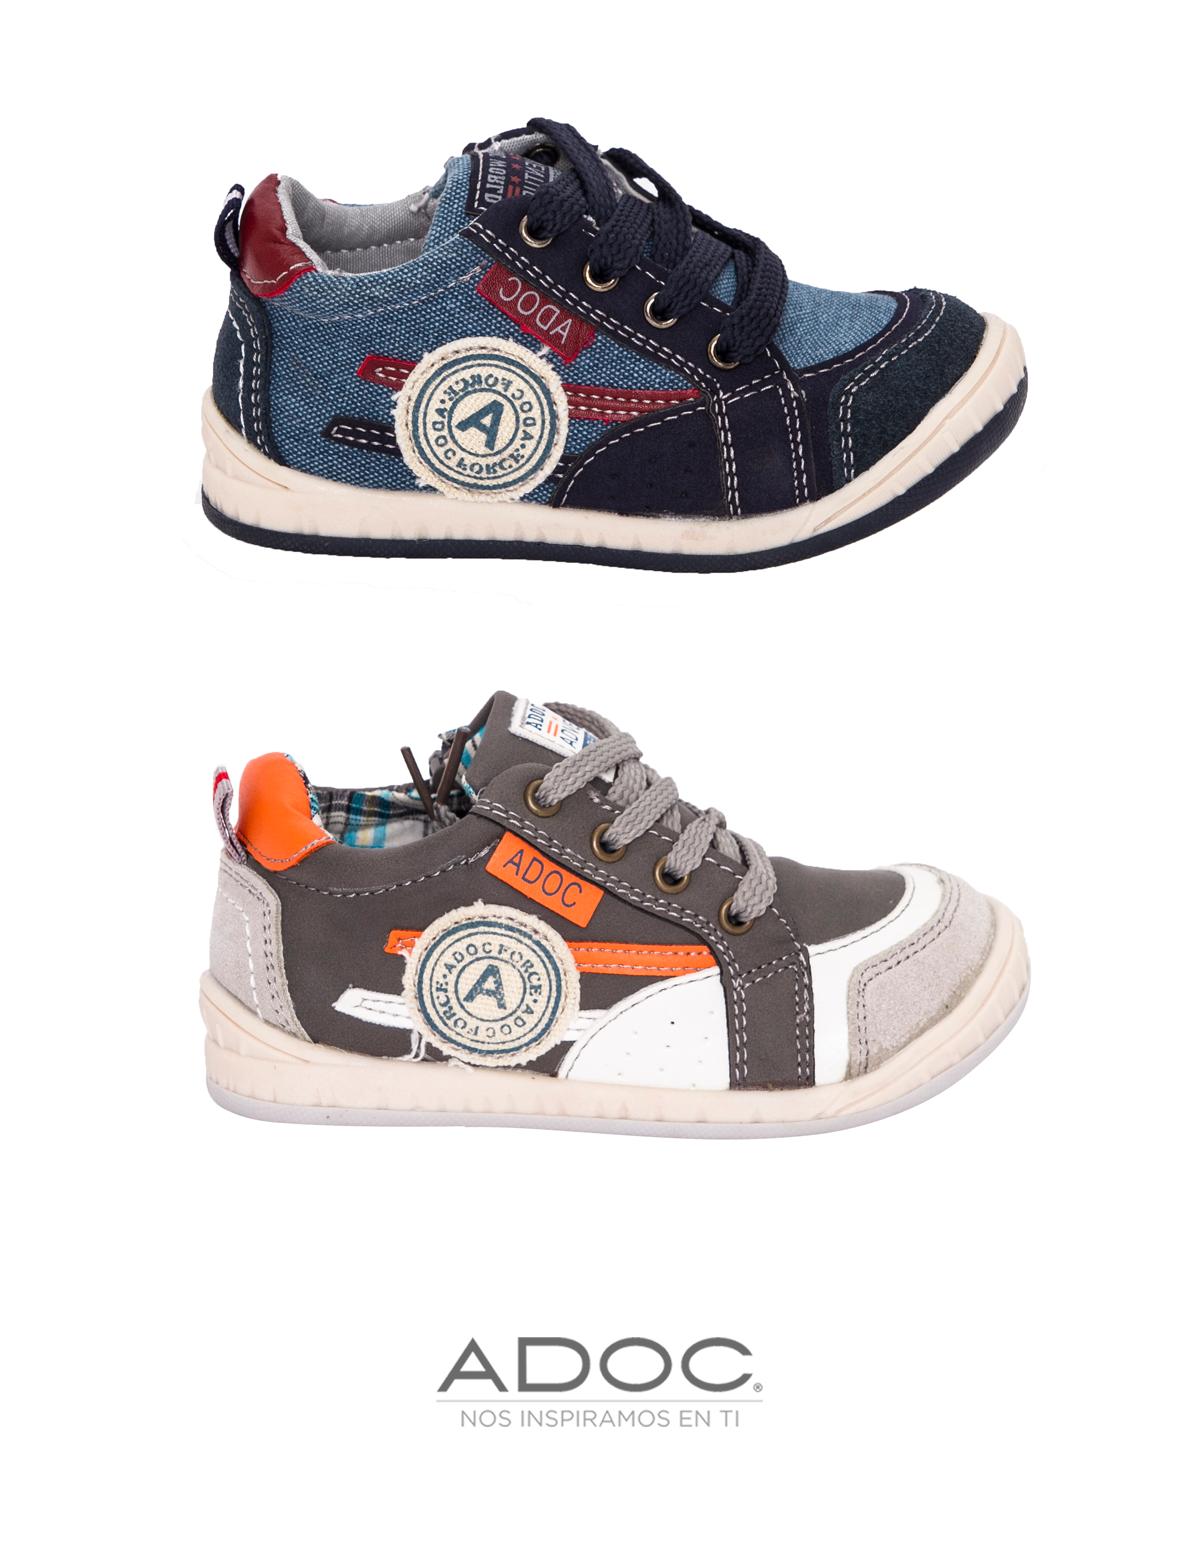 Zapatos blancos Be Only Alphabet infantiles talla 23 f39eW